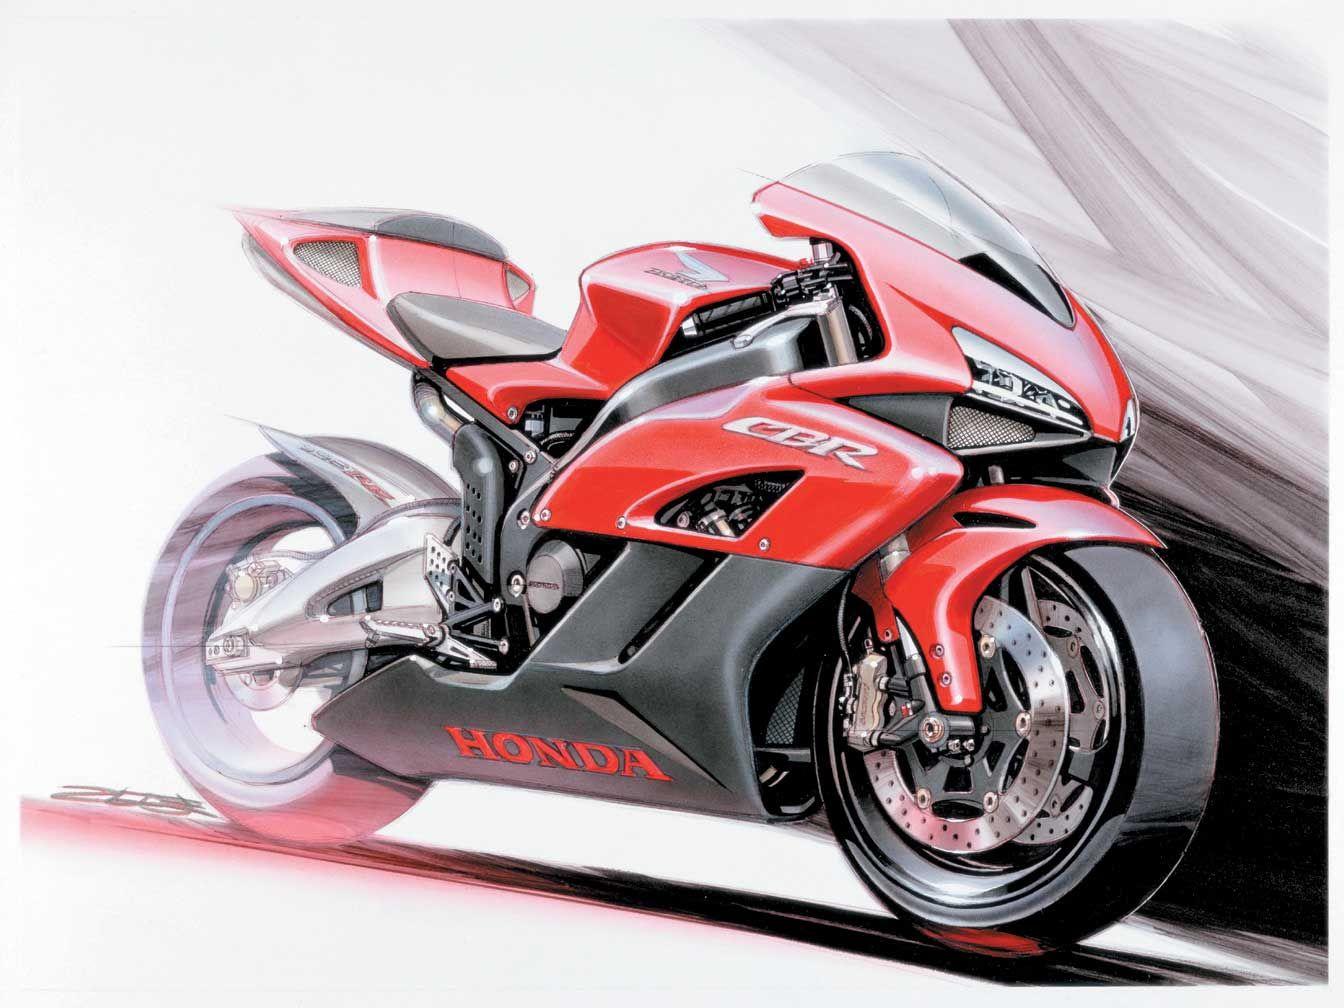 1344x1008 Honda 2004 Cbr1000rr Concept Drawing.jpg Motorcycle